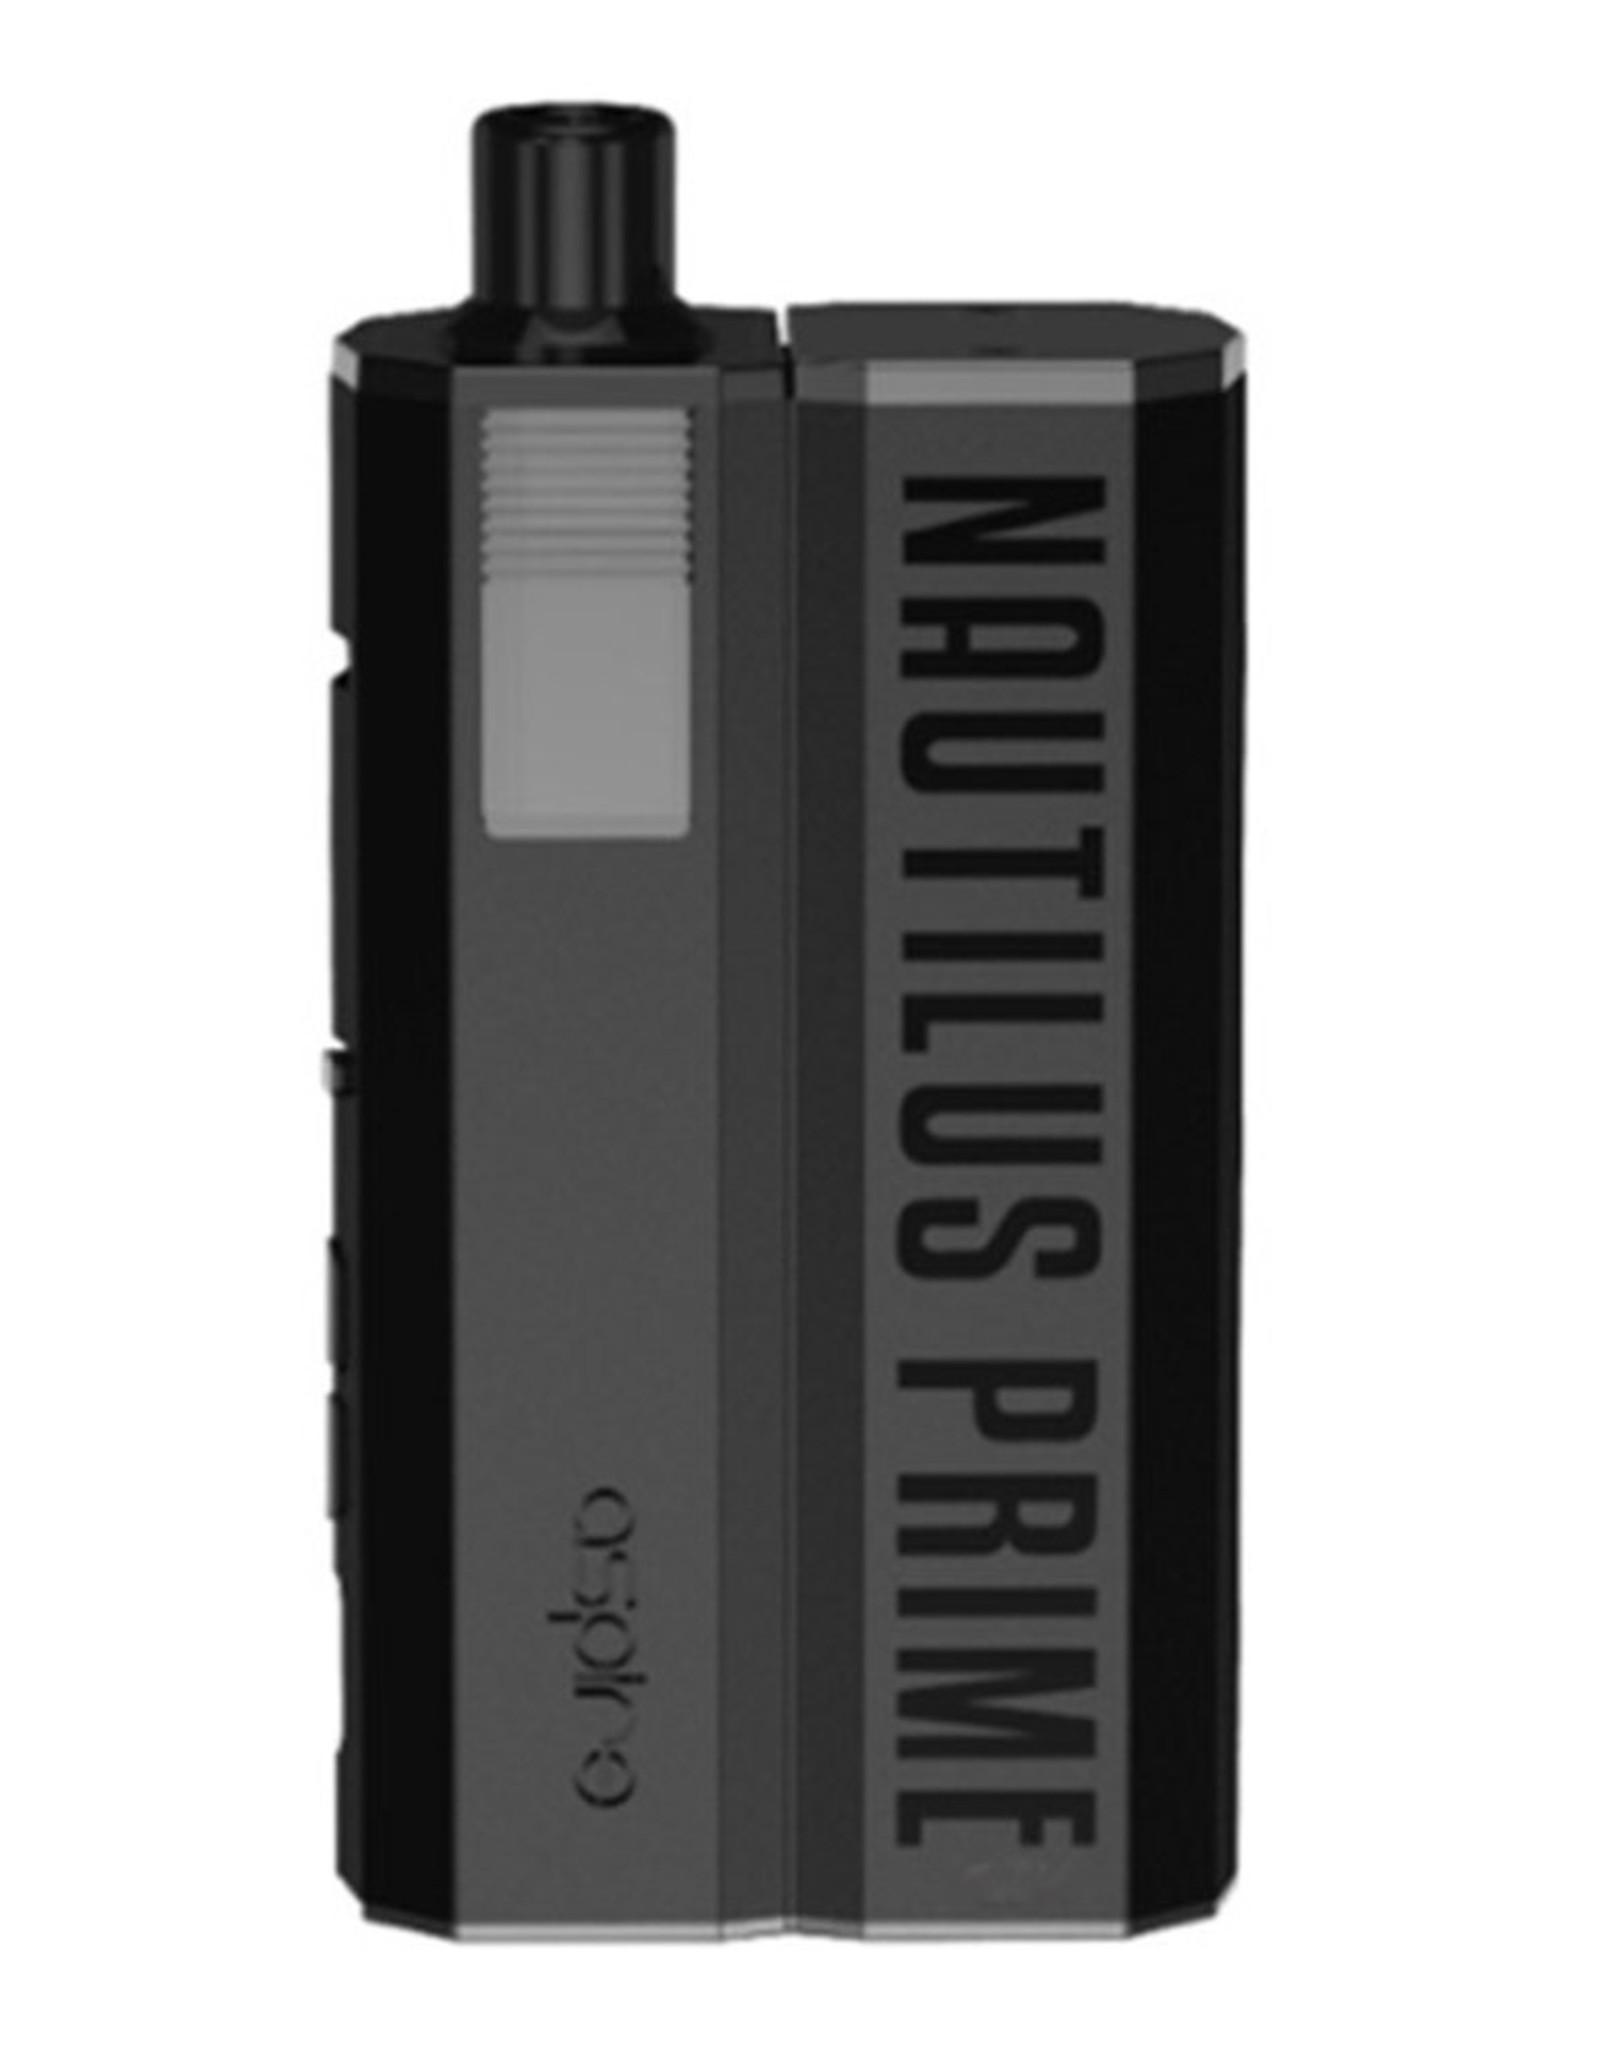 Aspire Aspire Nautilus Prime POD Kit